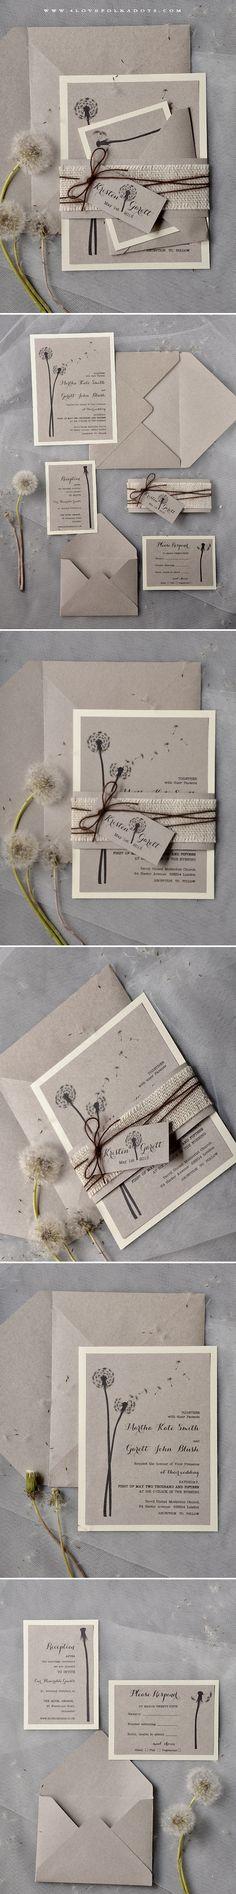 Wedding Invitations with Dandelions #ecofriendly #Dandelion #weddingideas #summerwedding